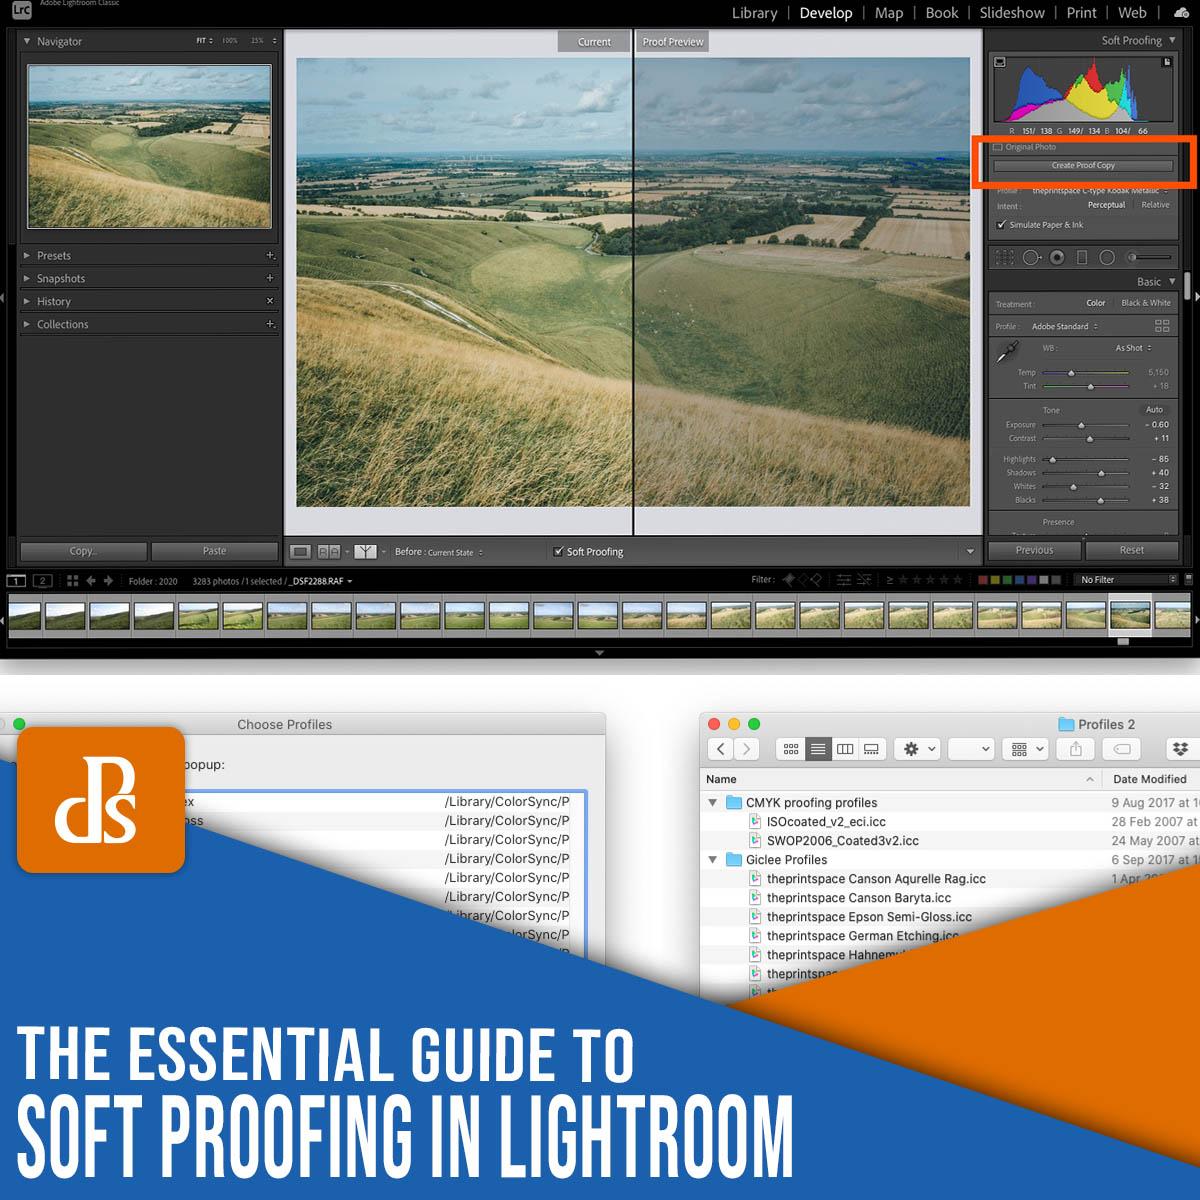 https://i0.wp.com/digital-photography-school.com/wp-content/uploads/2021/01/soft-proofing-in-lightroom-1033.jpg?resize=1200%2C1200&ssl=1